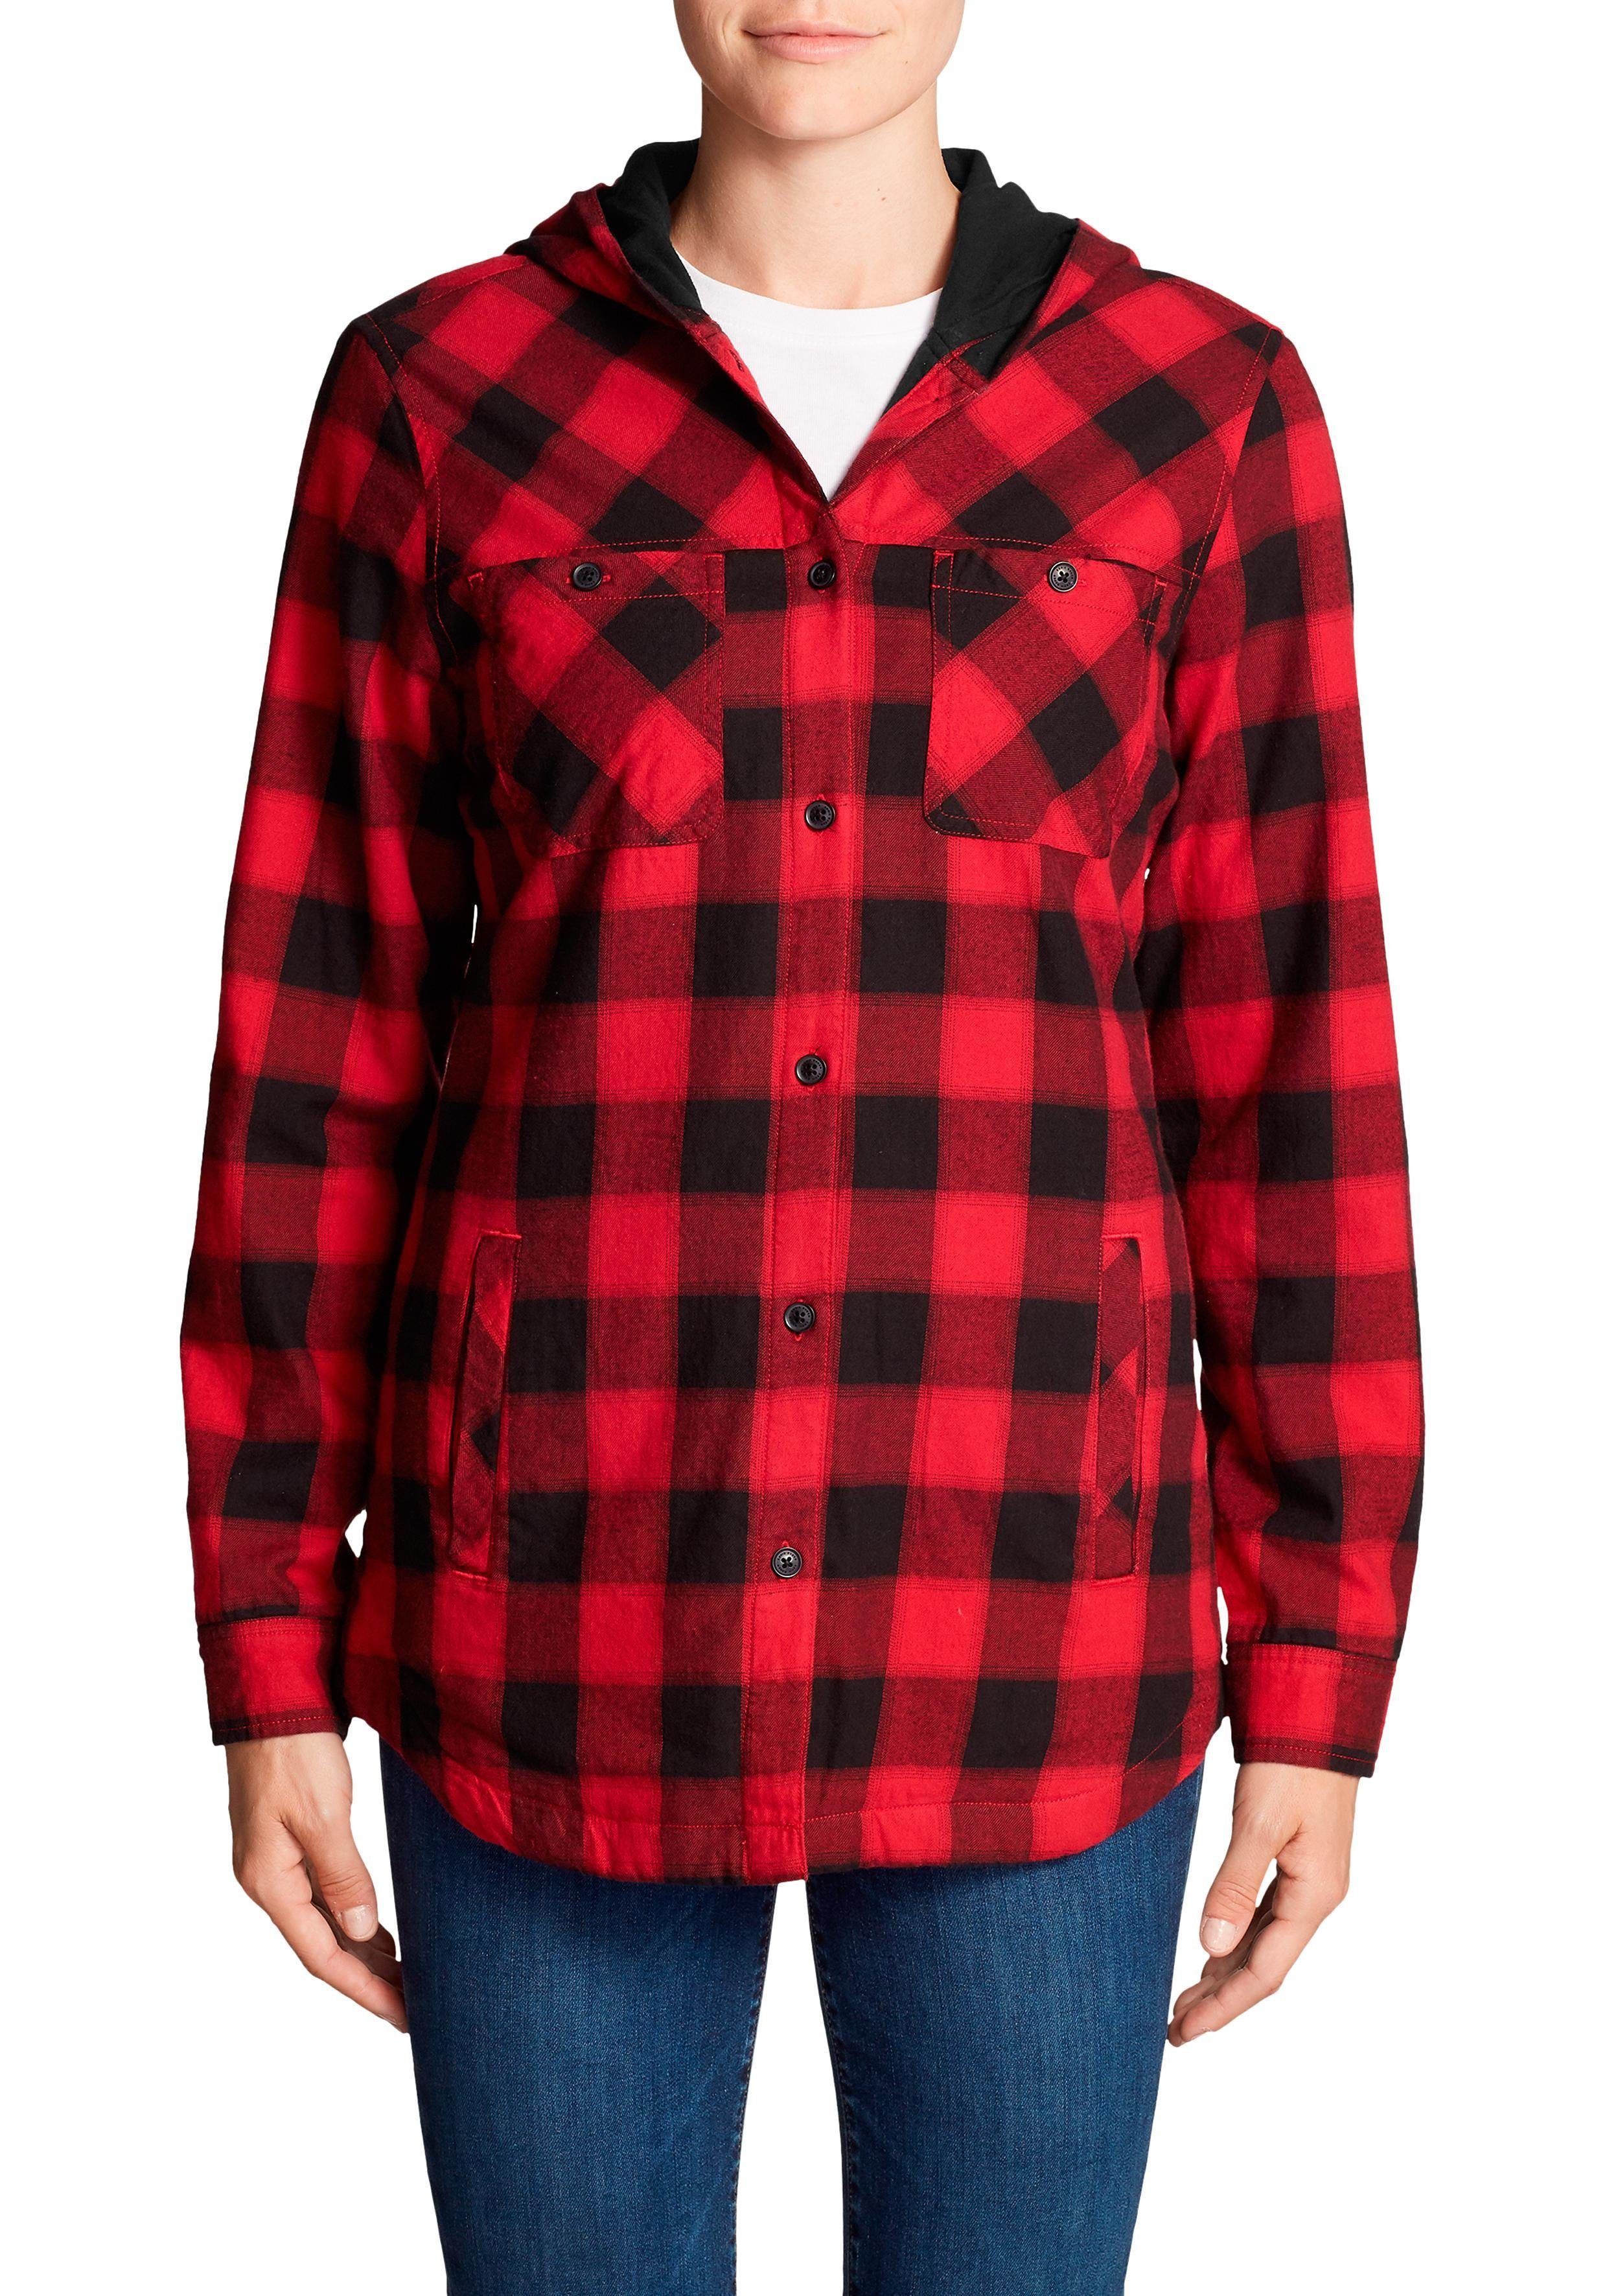 34-50 schönes Muster NEU 185 Boysens Tunika Bluse Shirt Gr